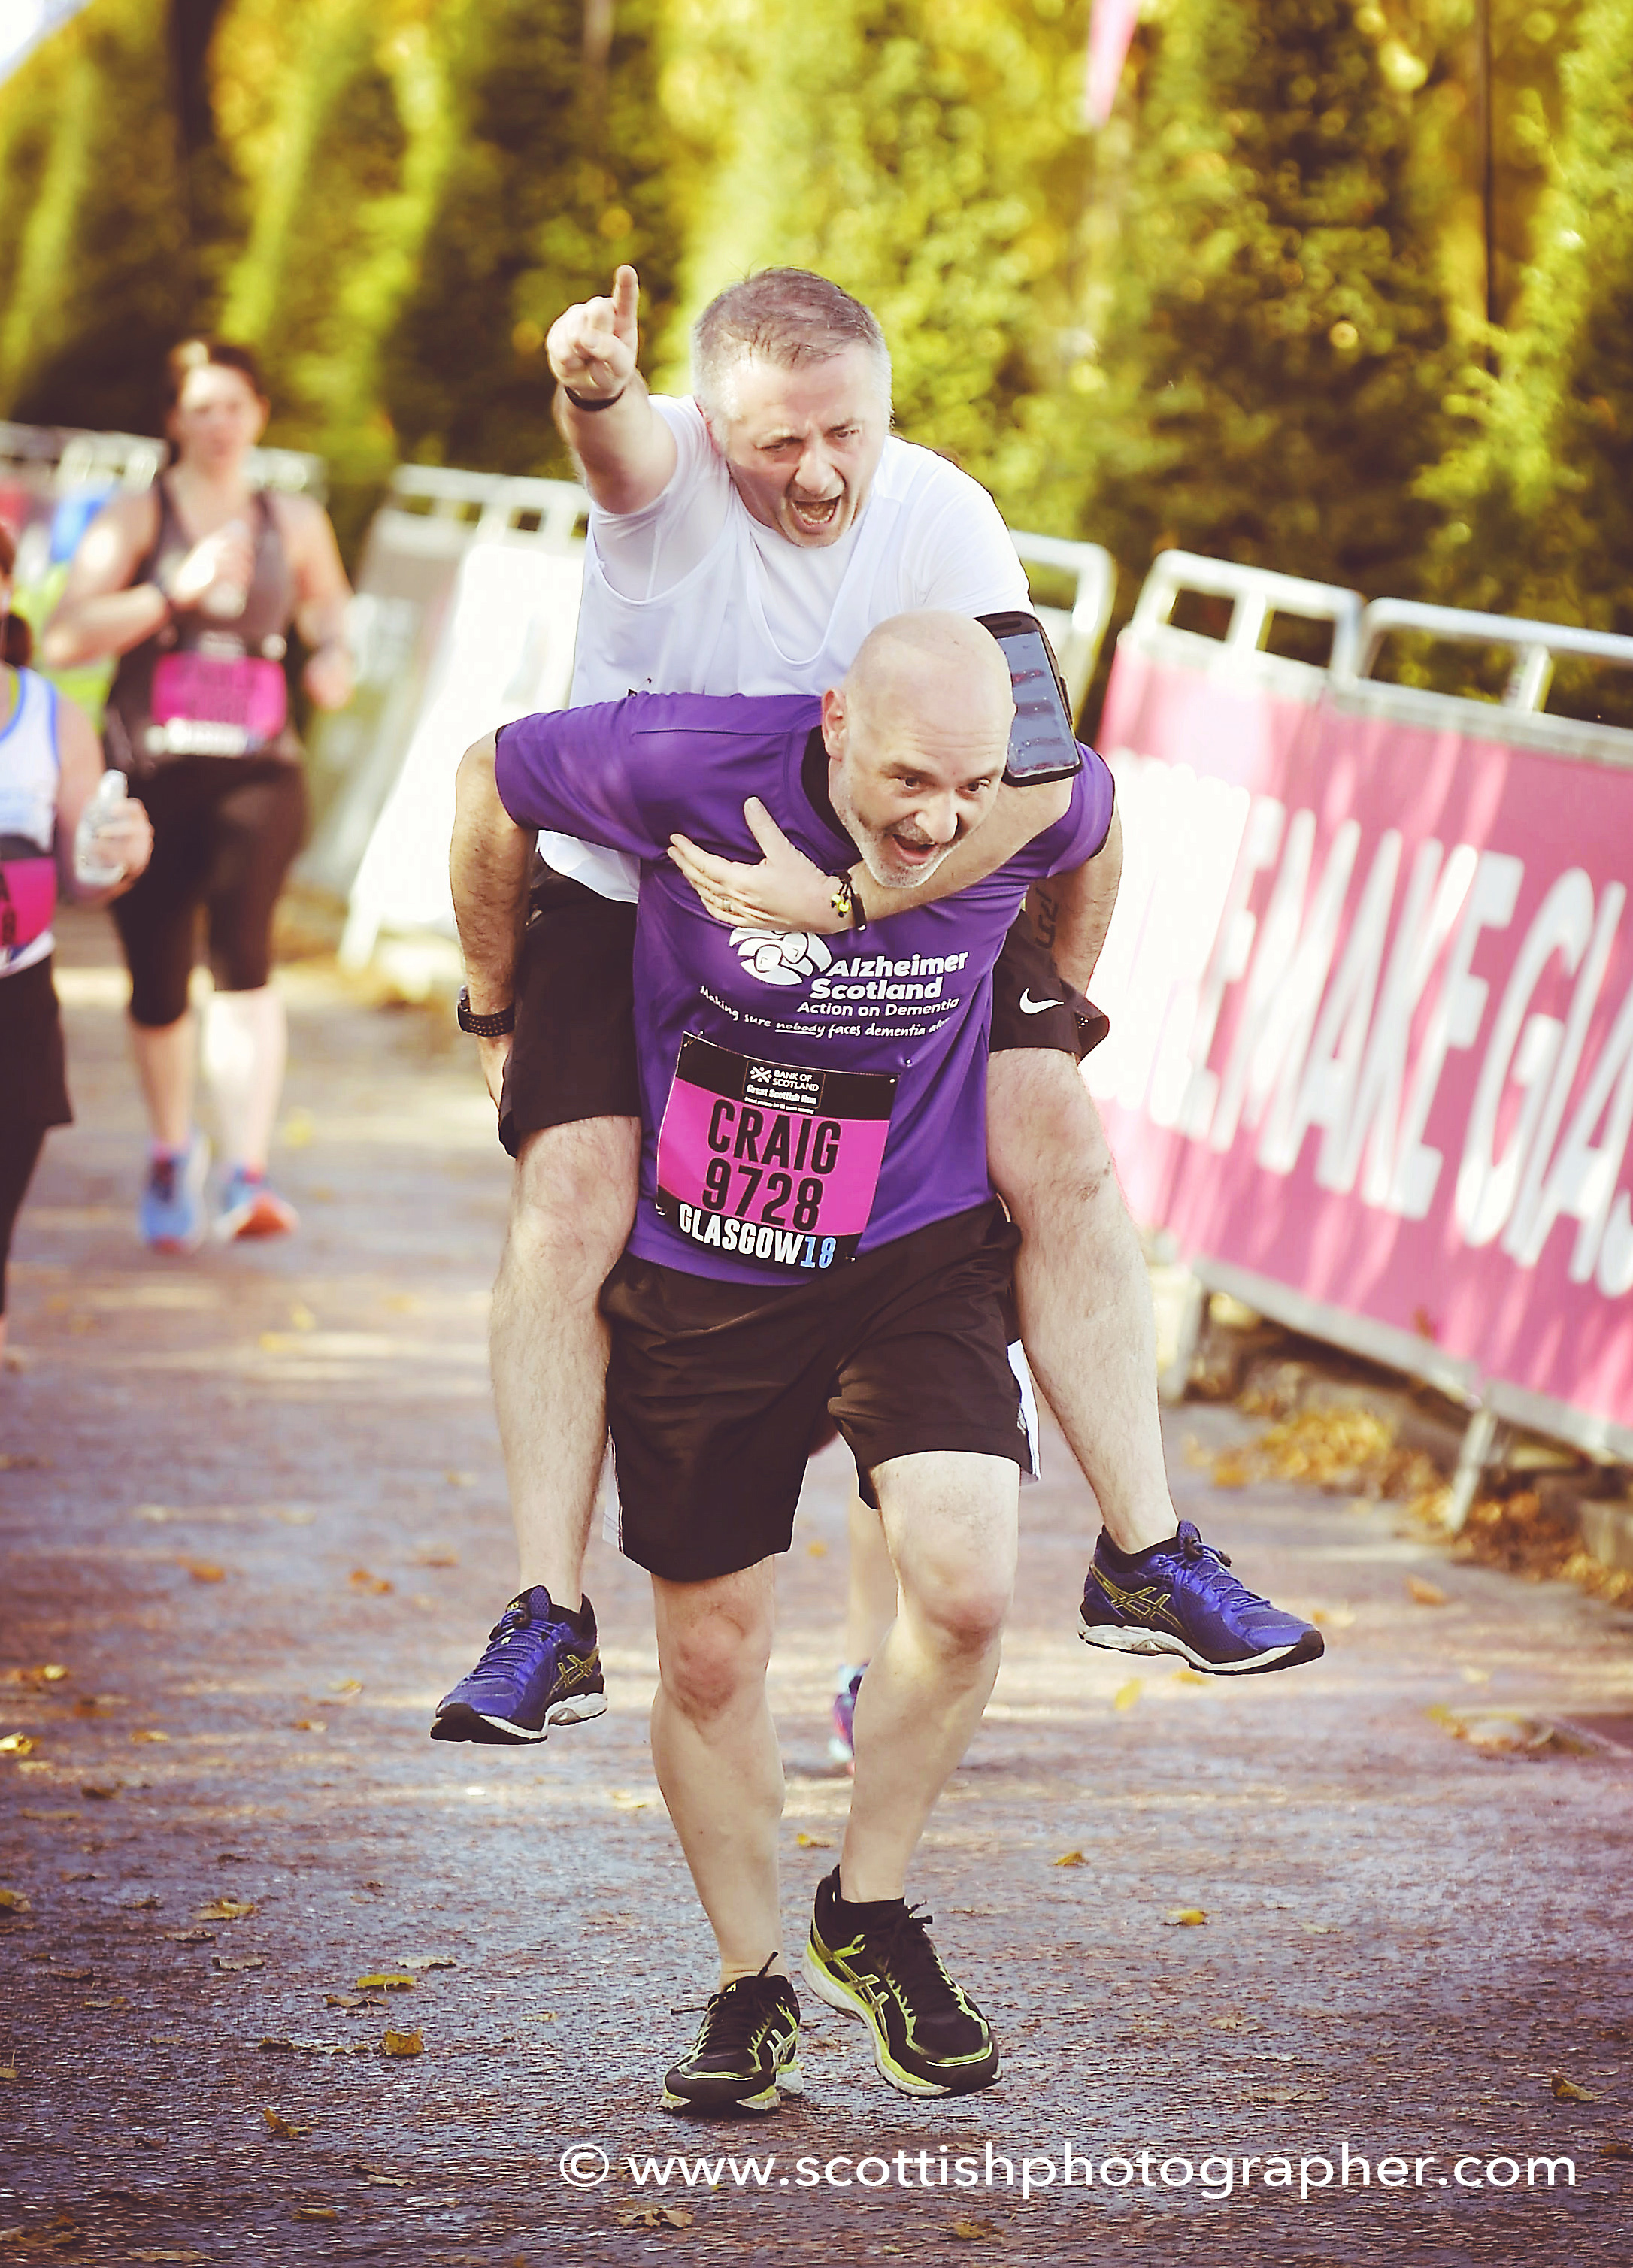 Glasgow Great North Run